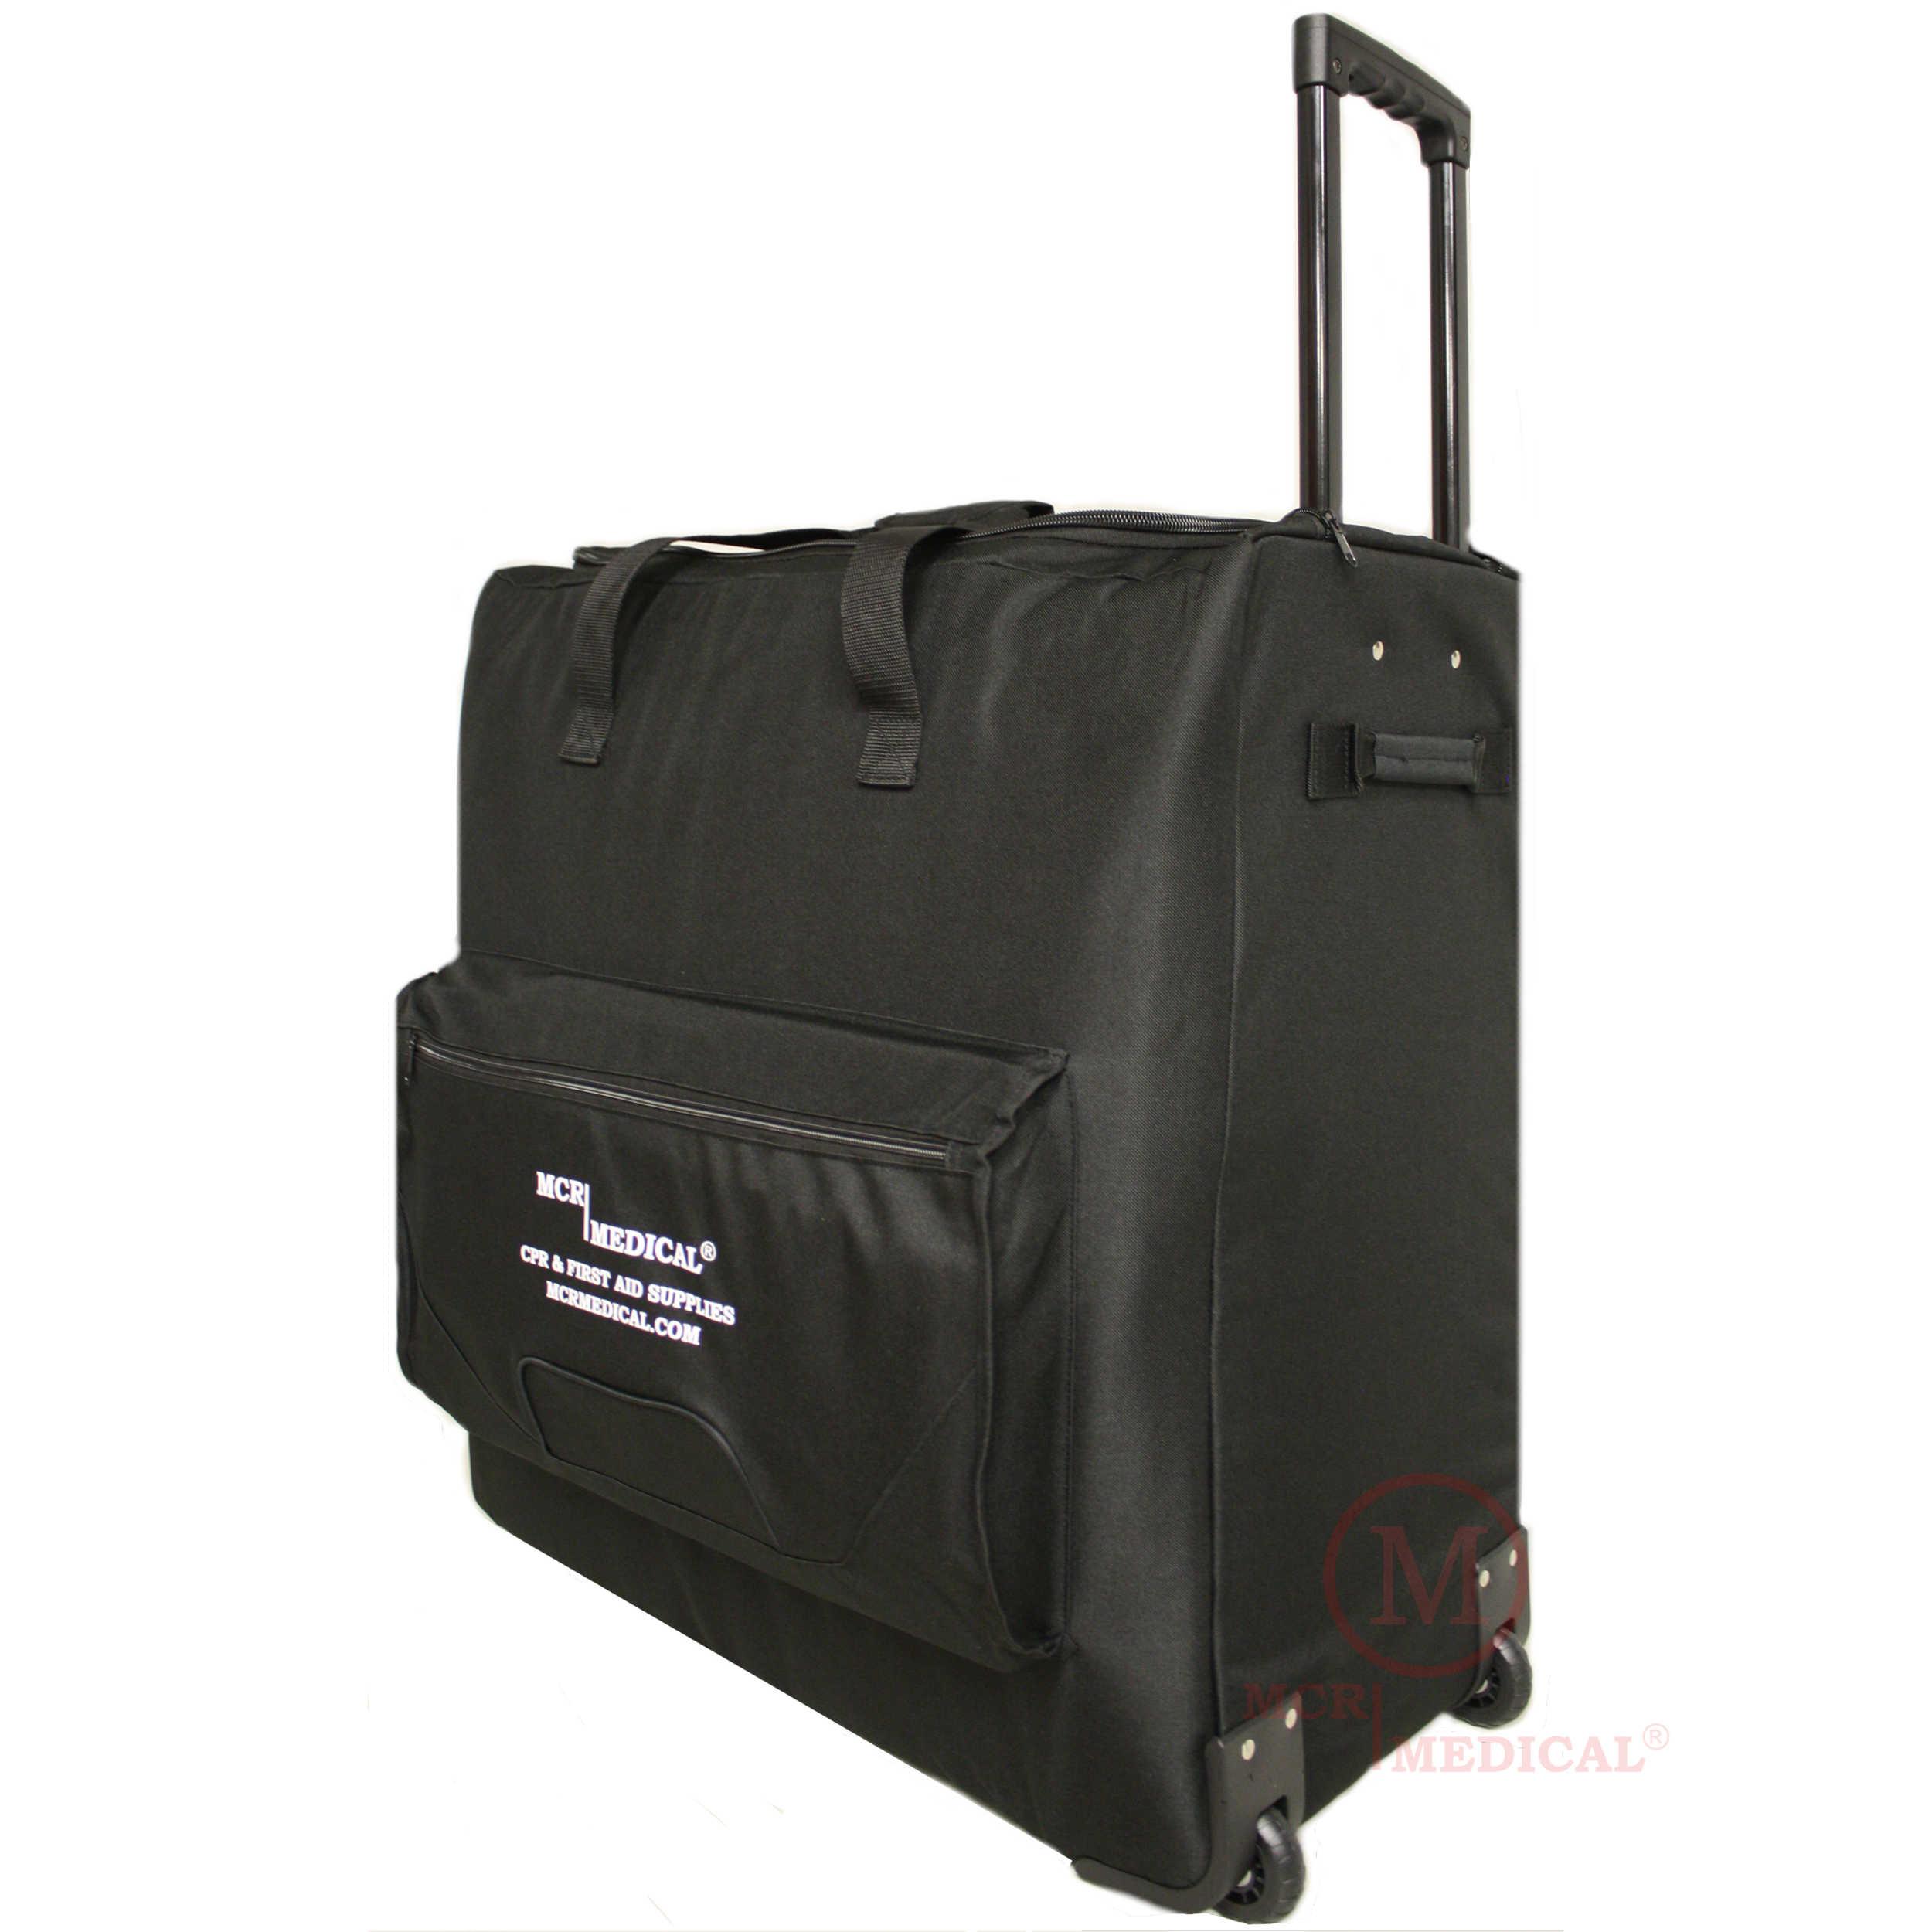 Carryall Cpr Manikin Bags